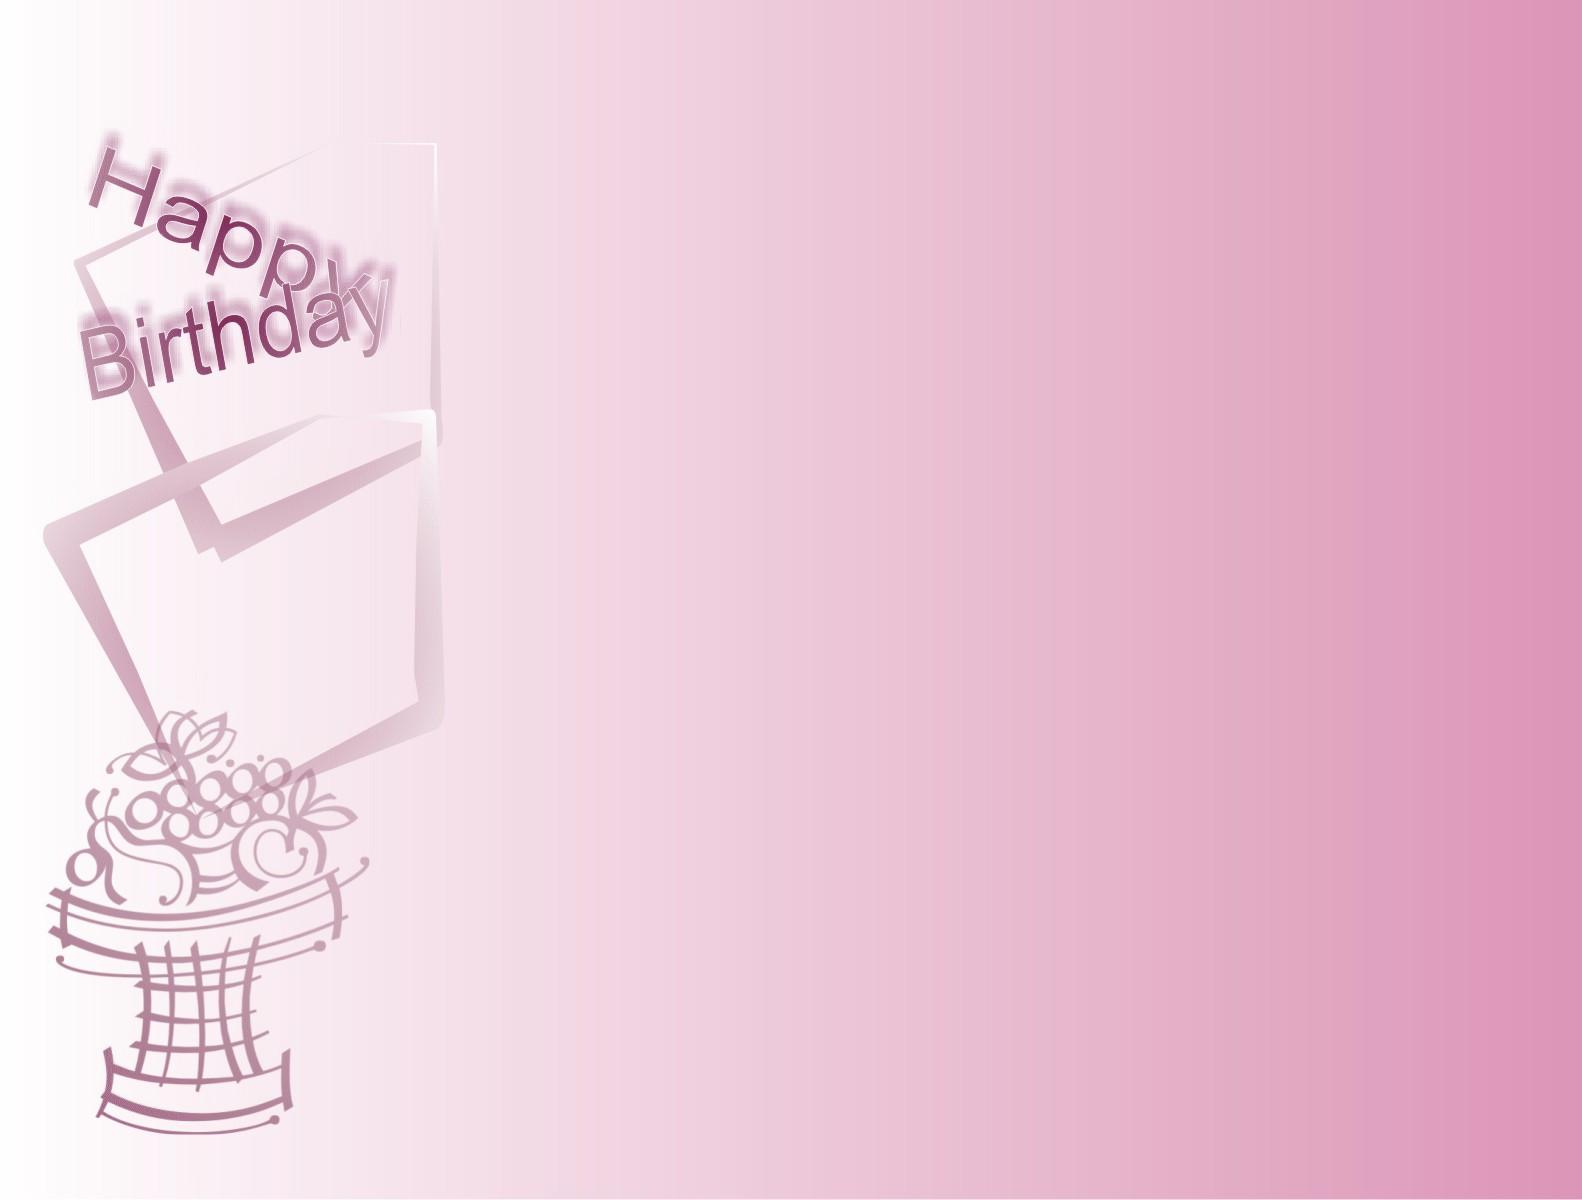 1582x1200px free happy birthday wallpaper images - wallpapersafari